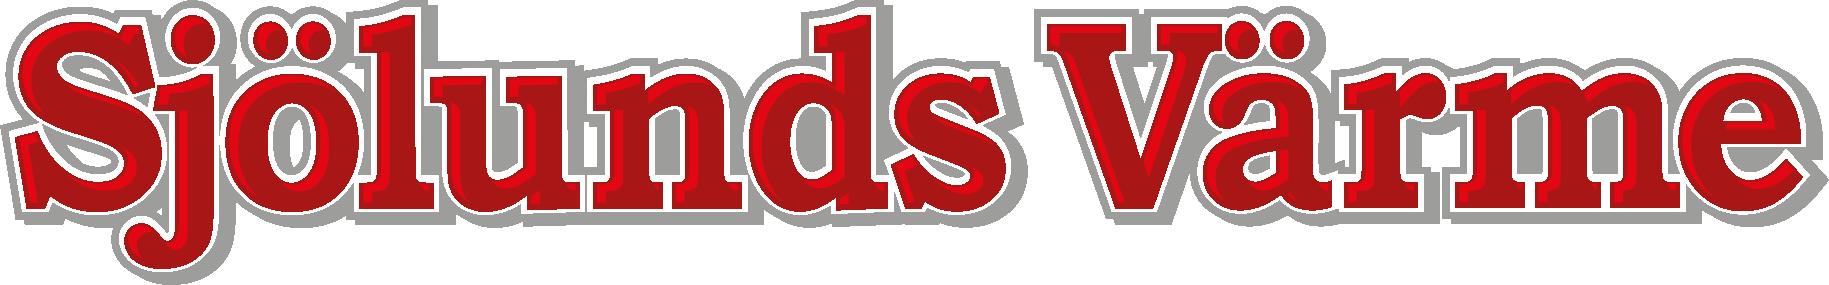 Sjölunds värme logotyp